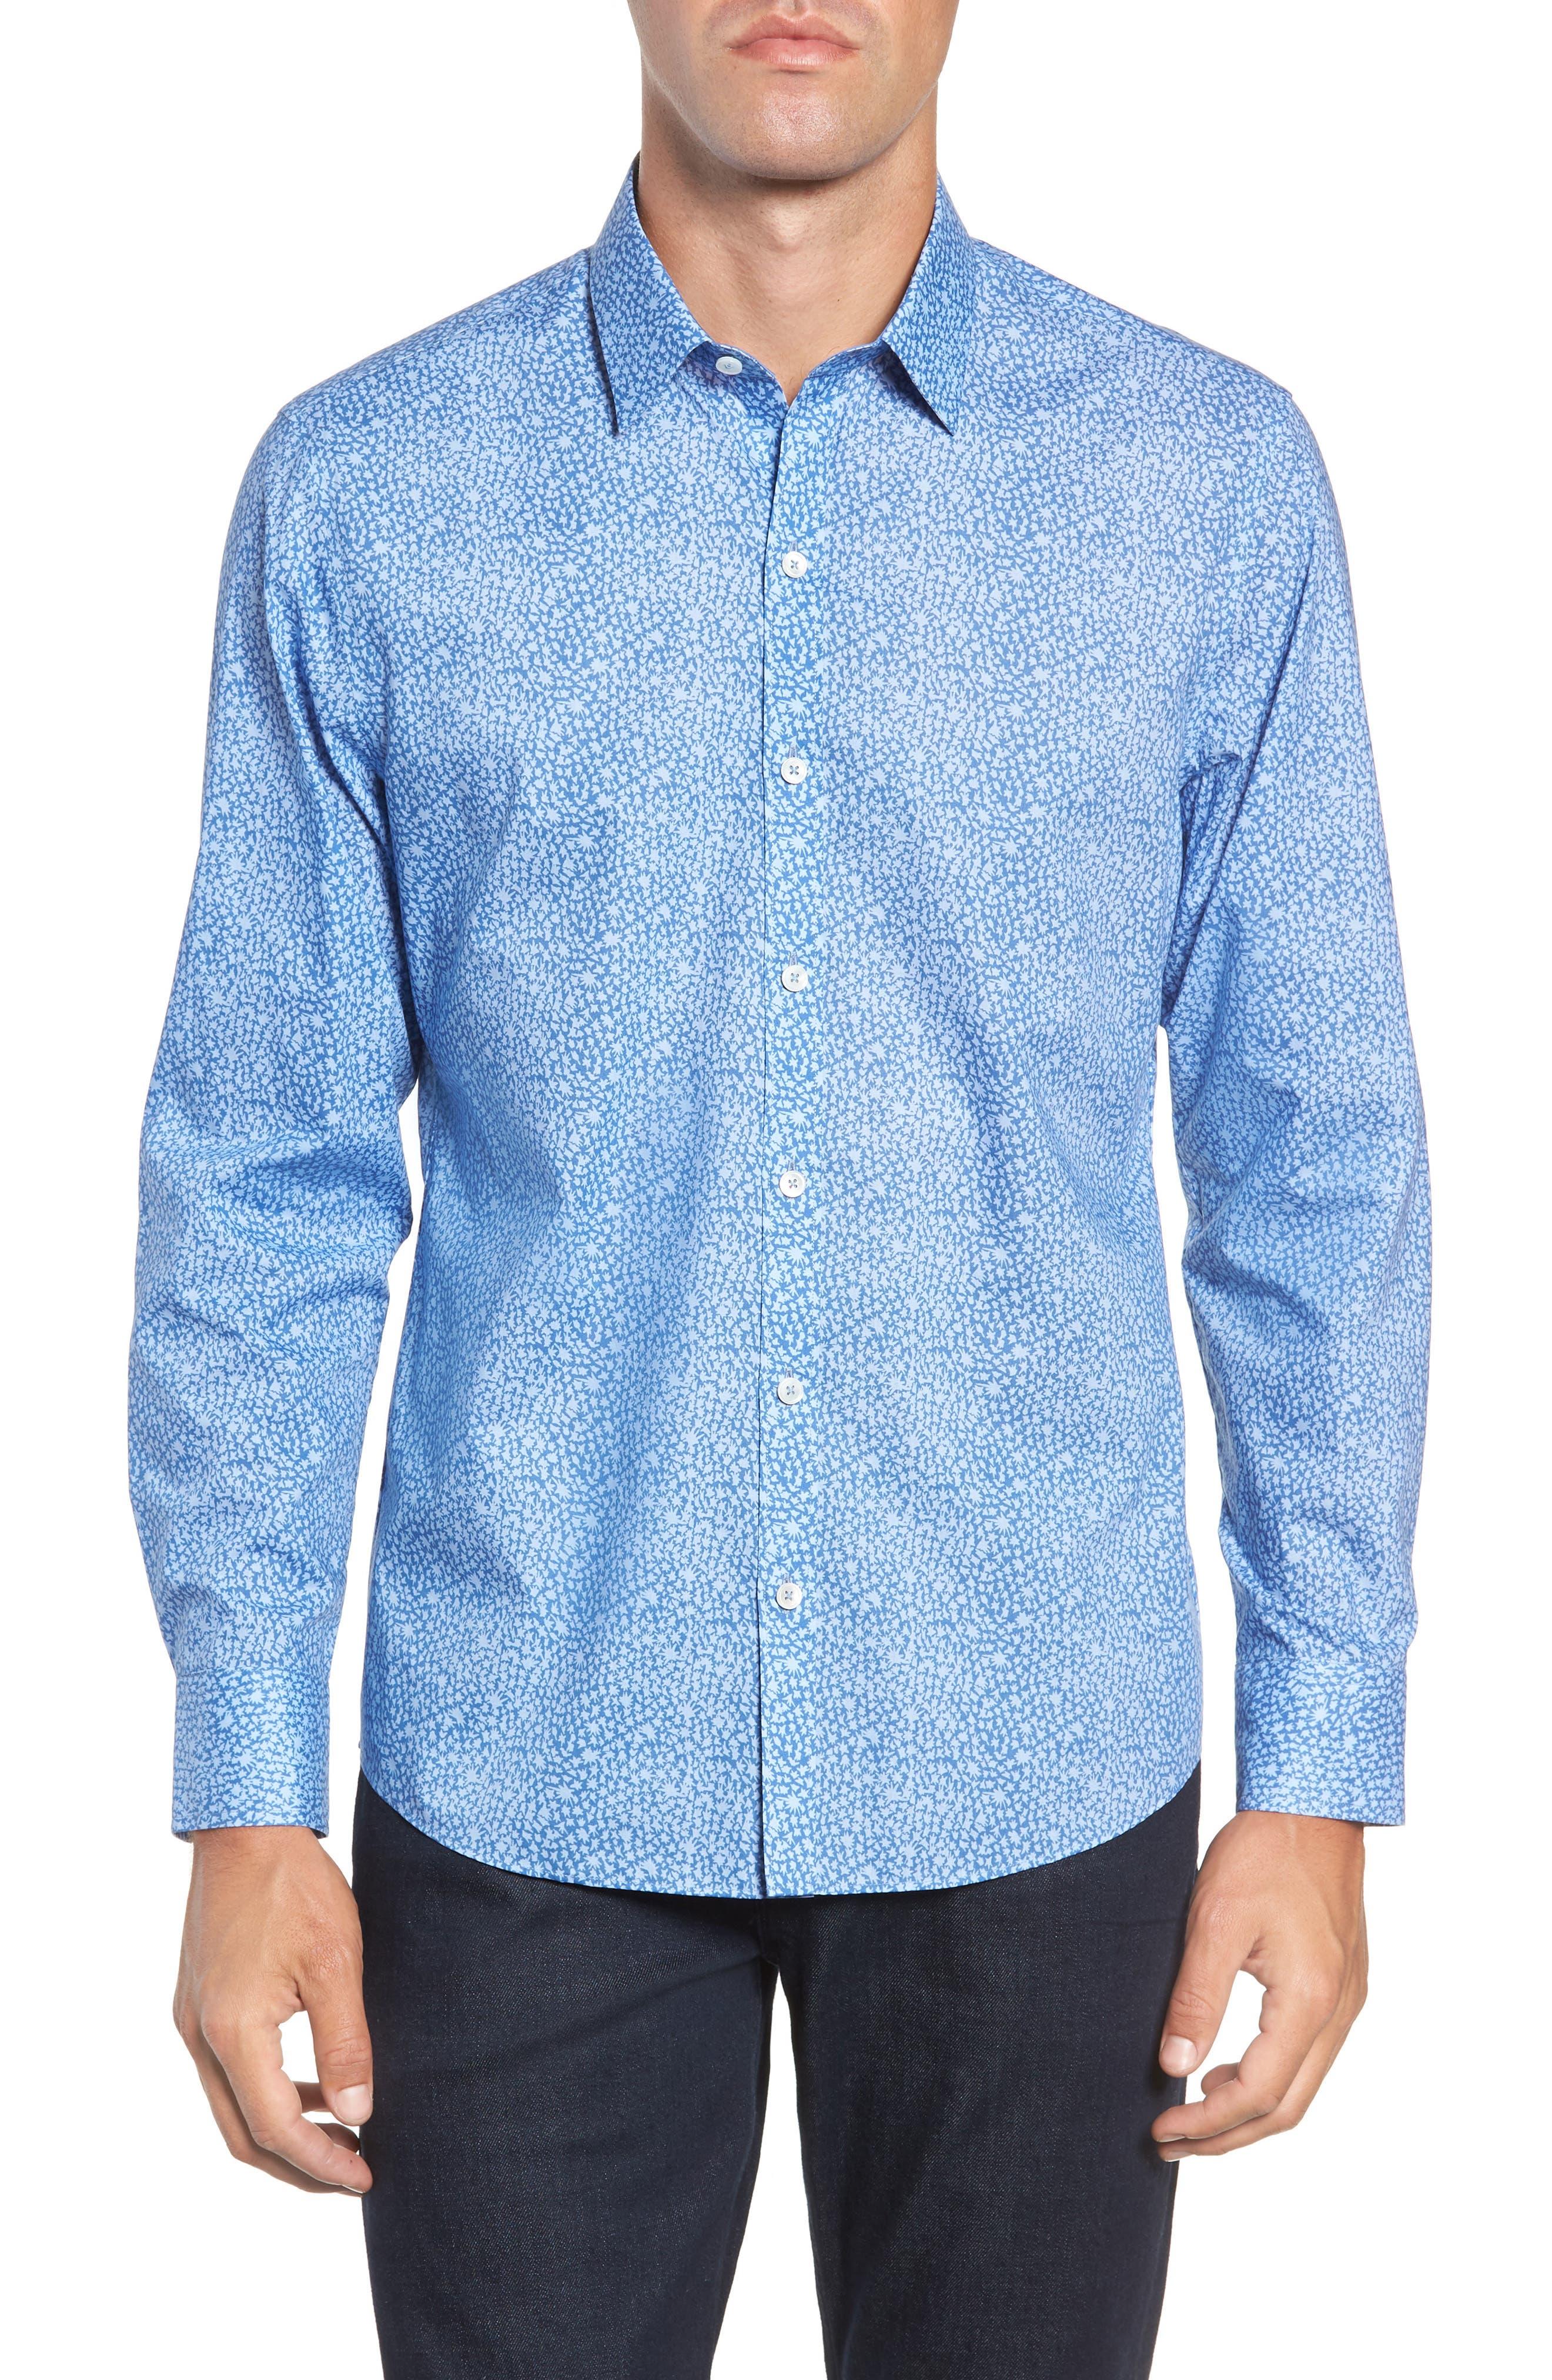 ZACHARY PRELL,                             Elliot Regular Fit Sport Shirt,                             Main thumbnail 1, color,                             OCEAN